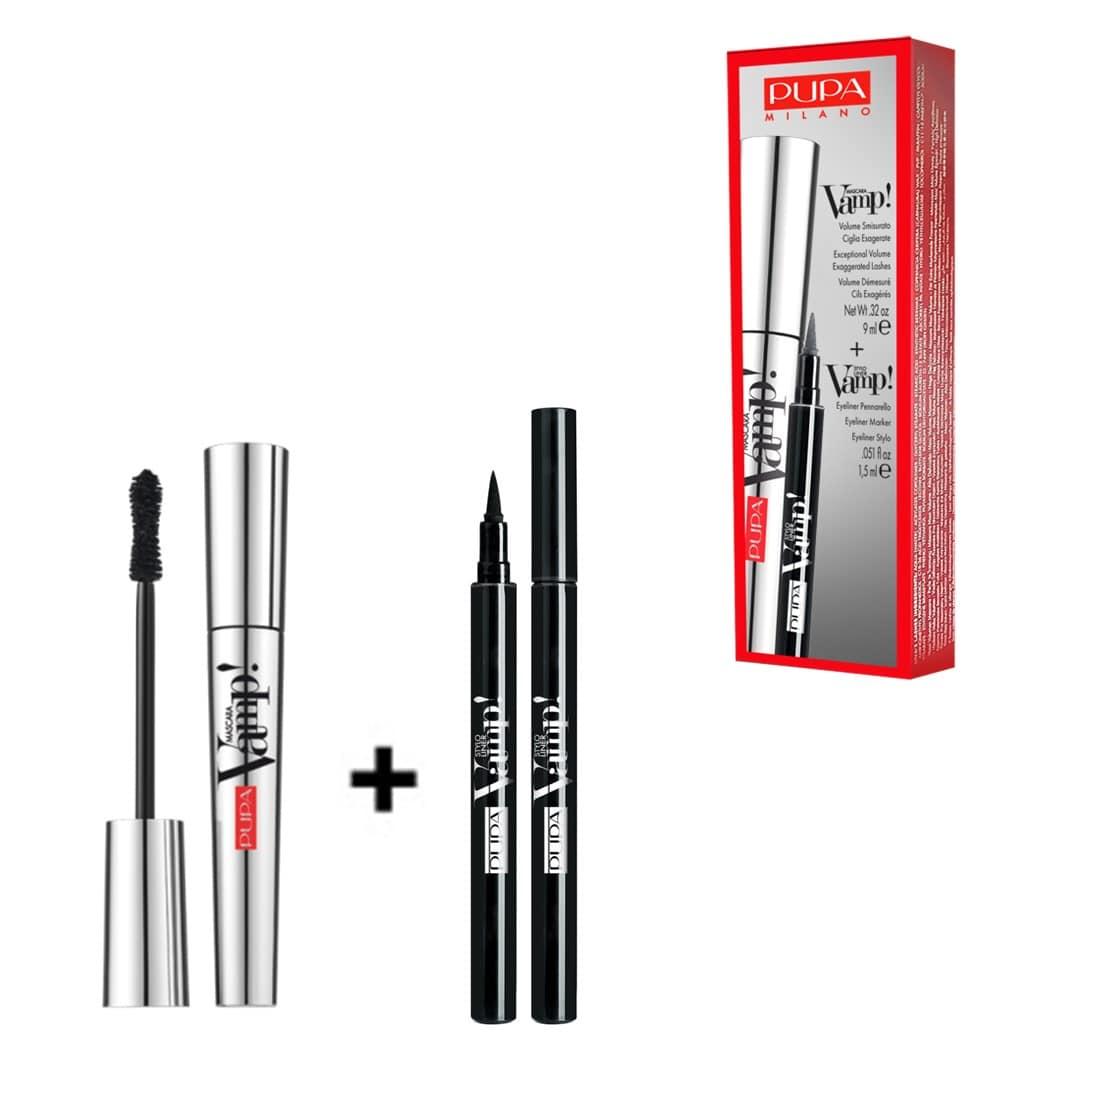 Set Vamp Mascara & Stylo Eyeliner Marker